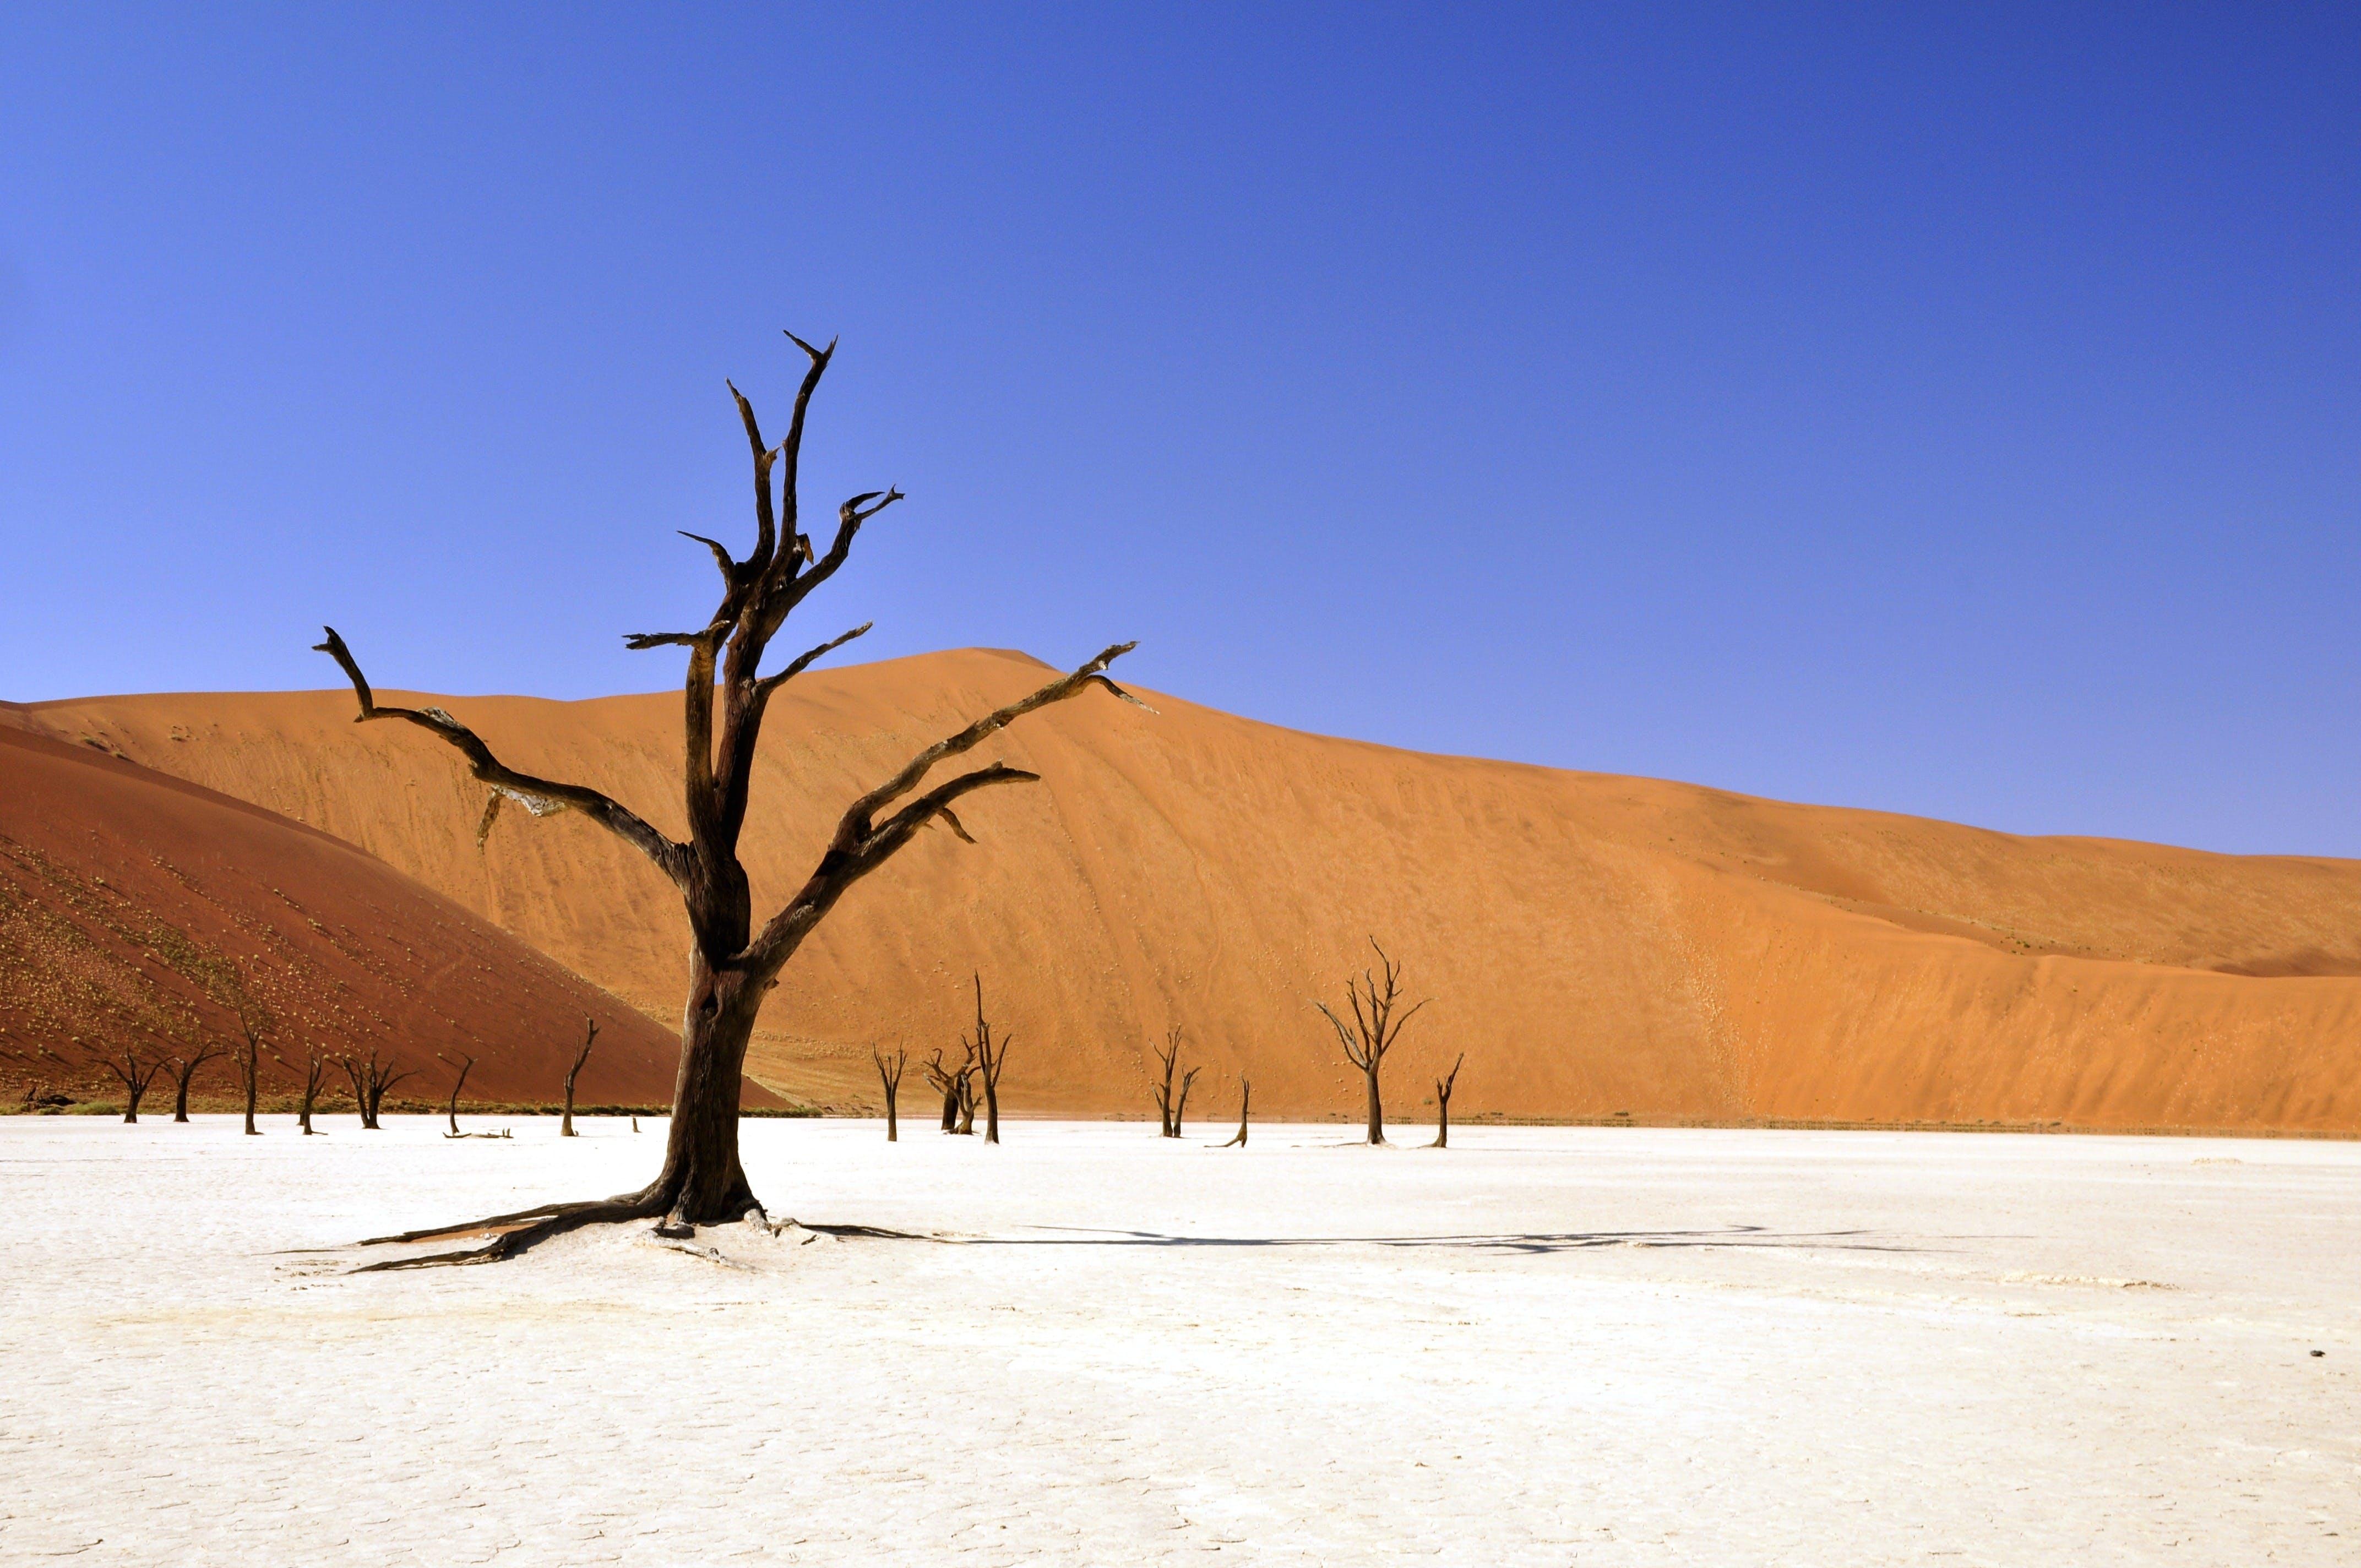 Kostenloses Stock Foto zu bäume, berge, dürre, heiß